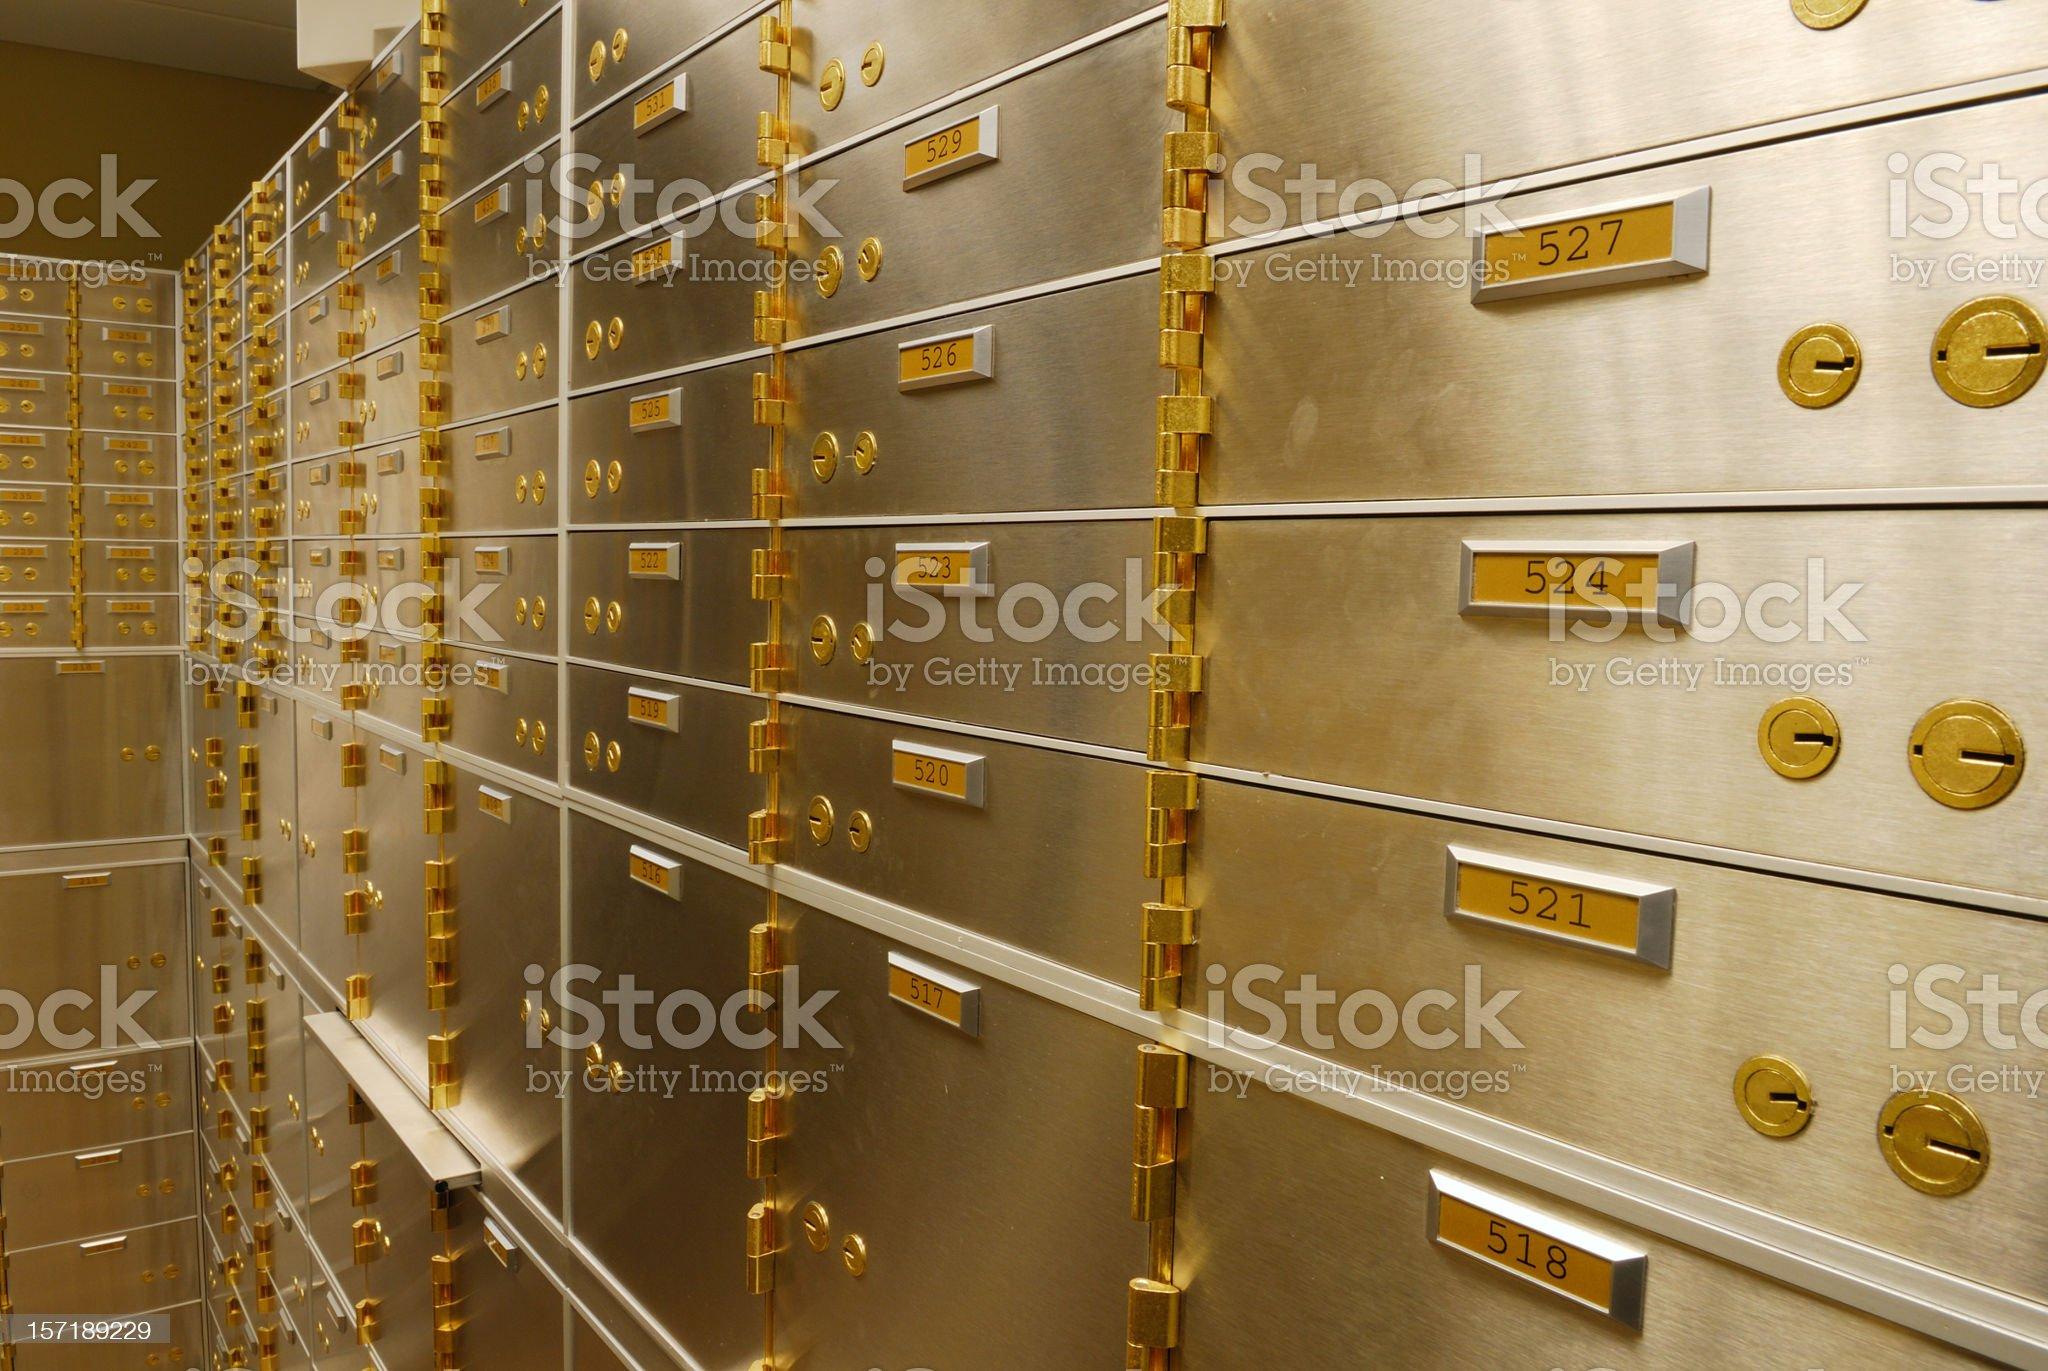 Safe Deposit Boxes royalty-free stock photo